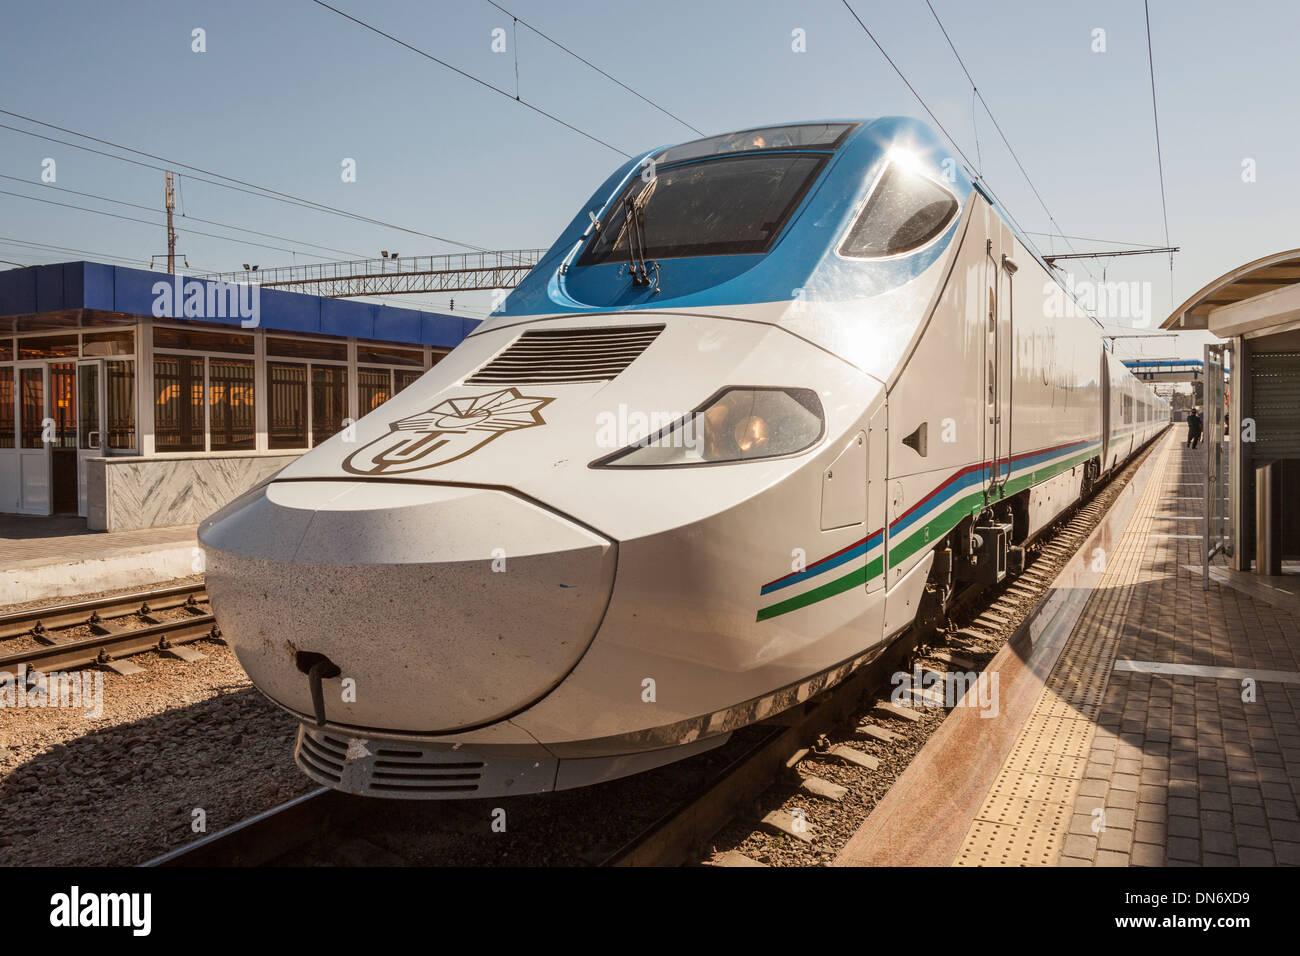 Afrosiyob Samarkand to Tashkent fast train, Samarqand railway station, Samarkand, Uzbekistan Stock Photo